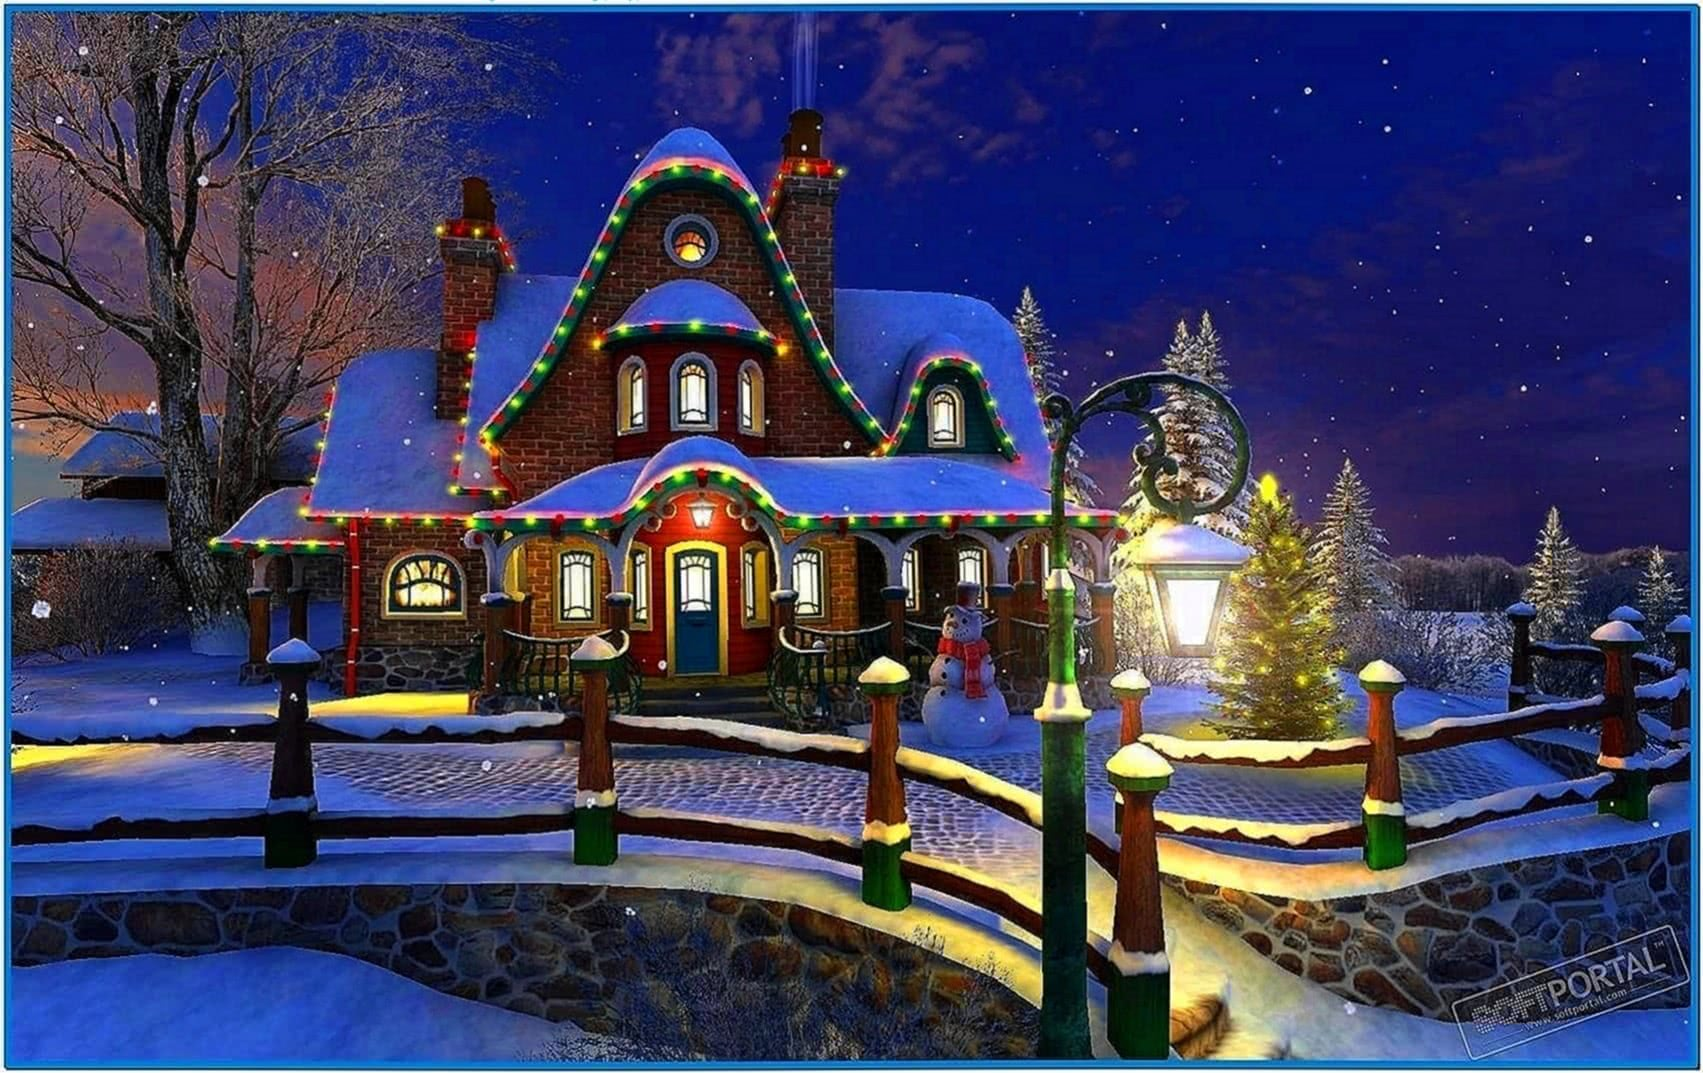 White Christmas 3D Screensaver 1.0 - Download-Screensavers.biz